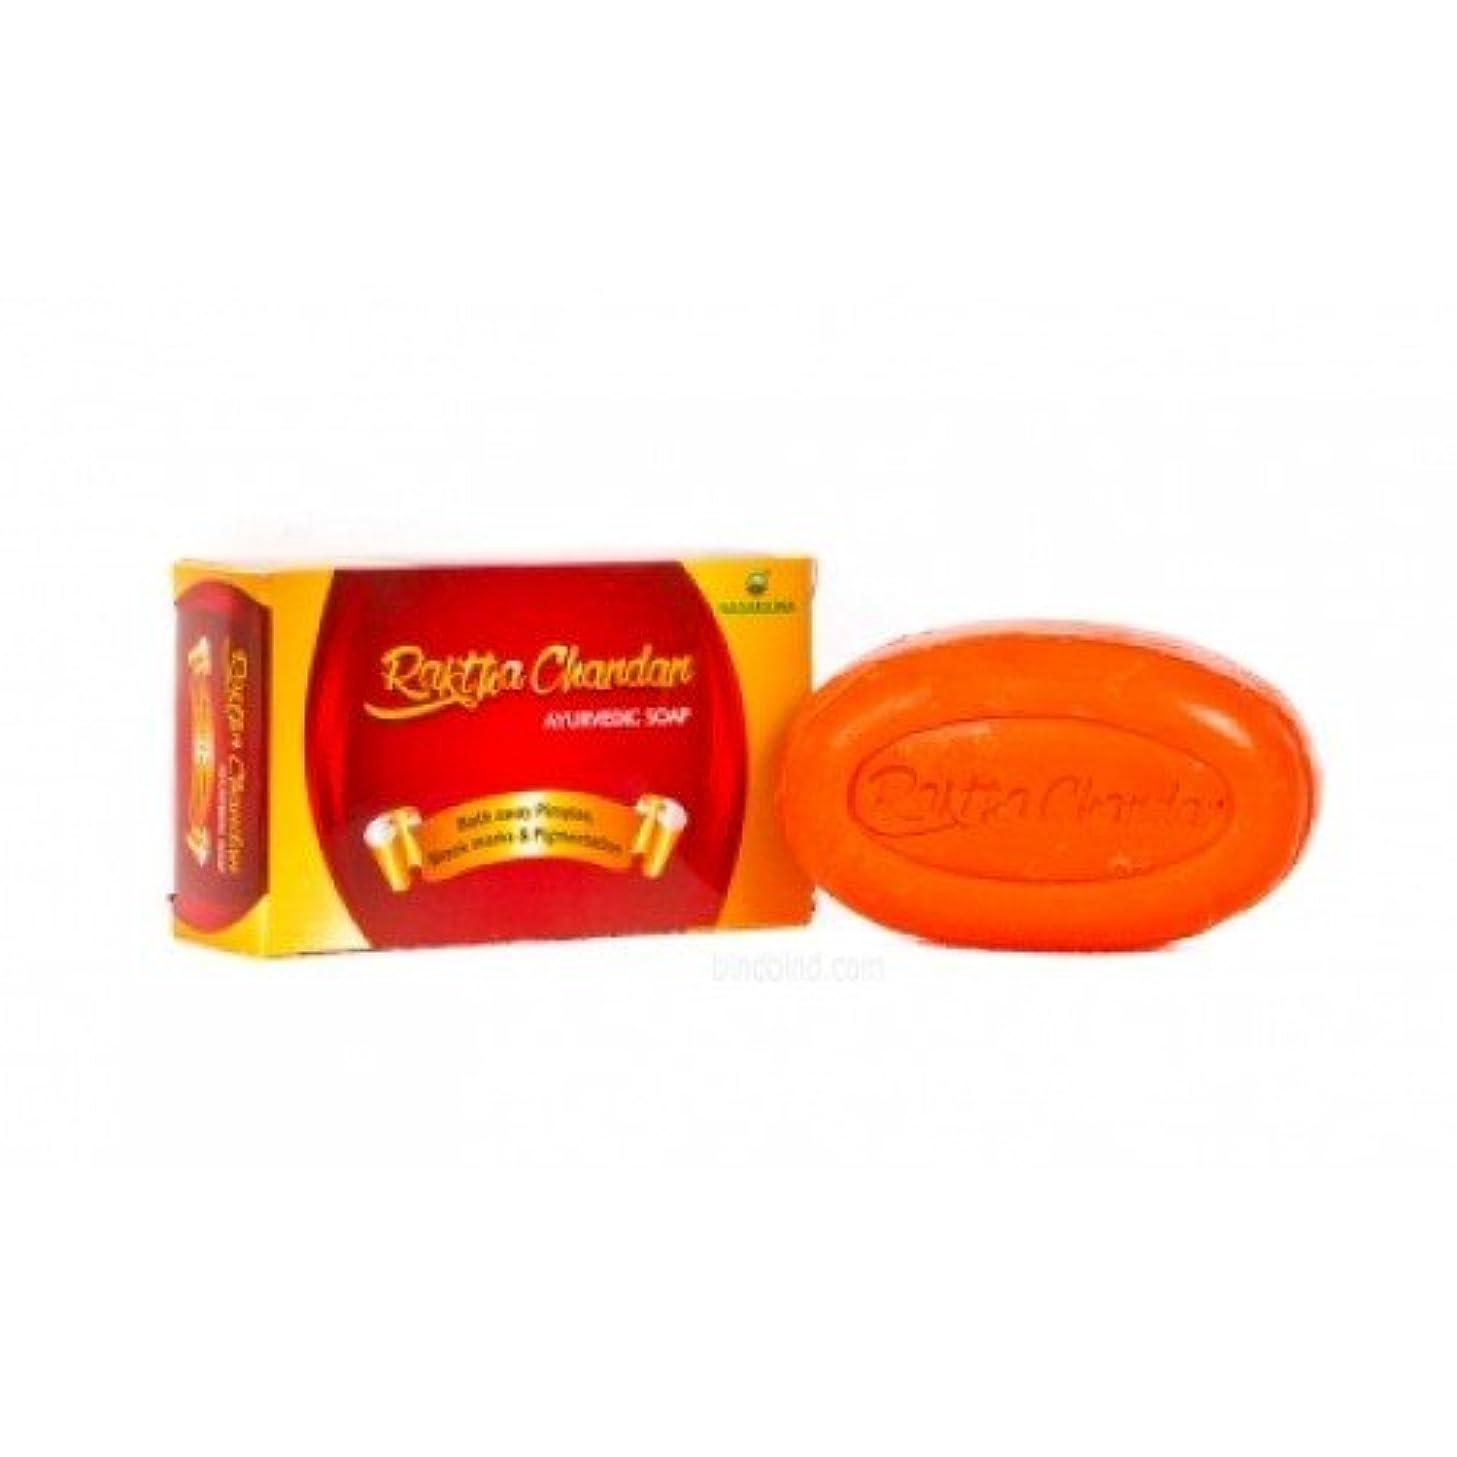 地下鉄大人奴隷Nagarjuna Raktha Chandan Ayurvedic Soap Best For Glowing Skin